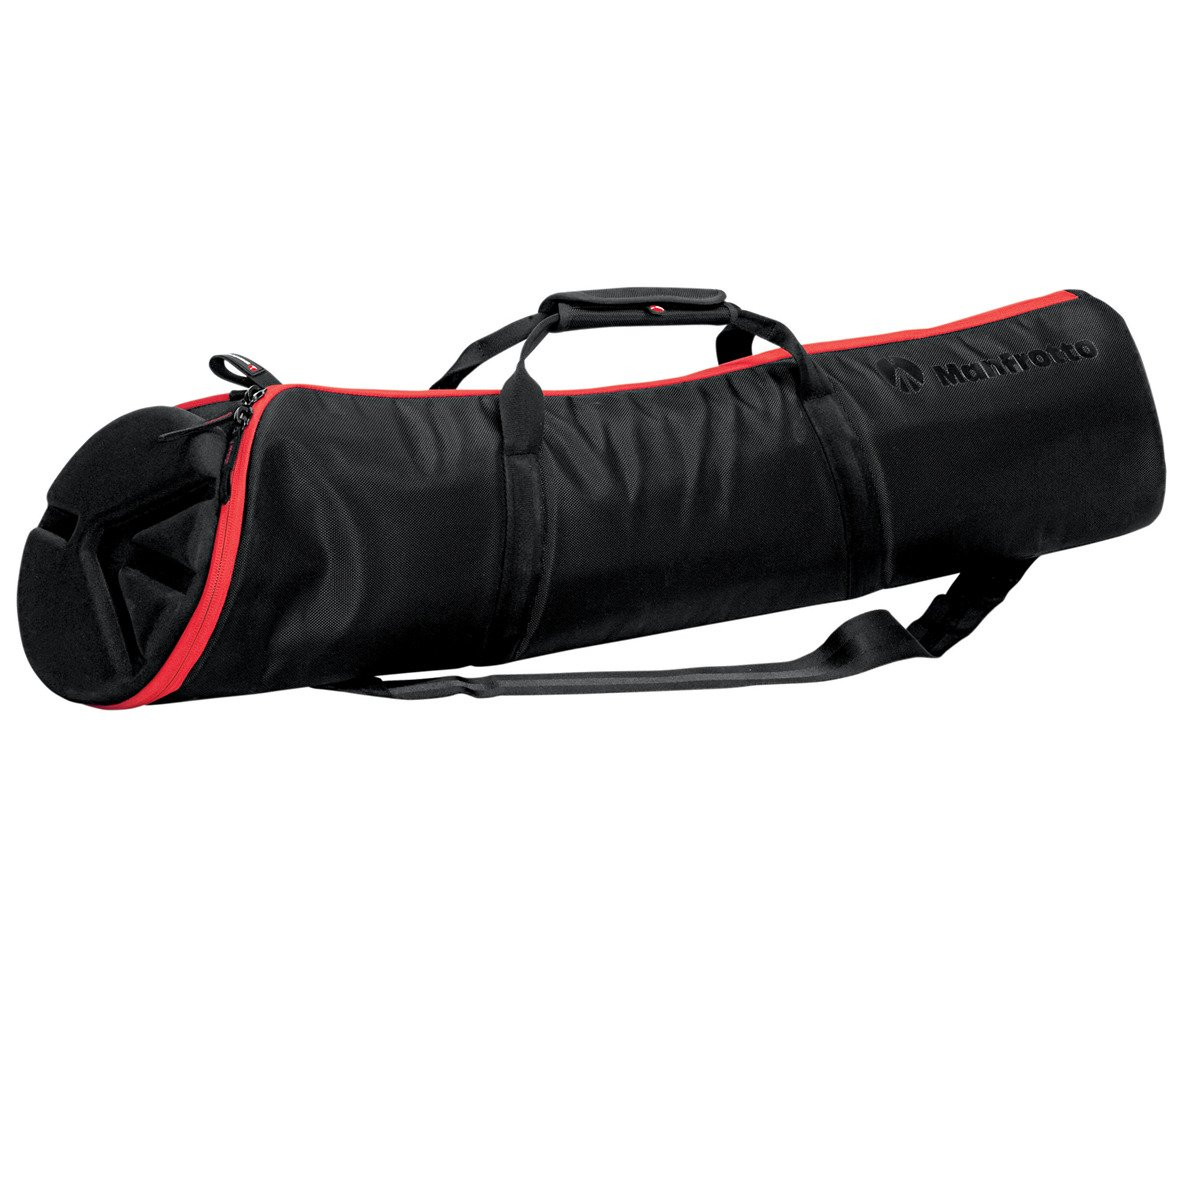 Manfrotto MB MBAG90PN Padded 90 cm Tripod Bag